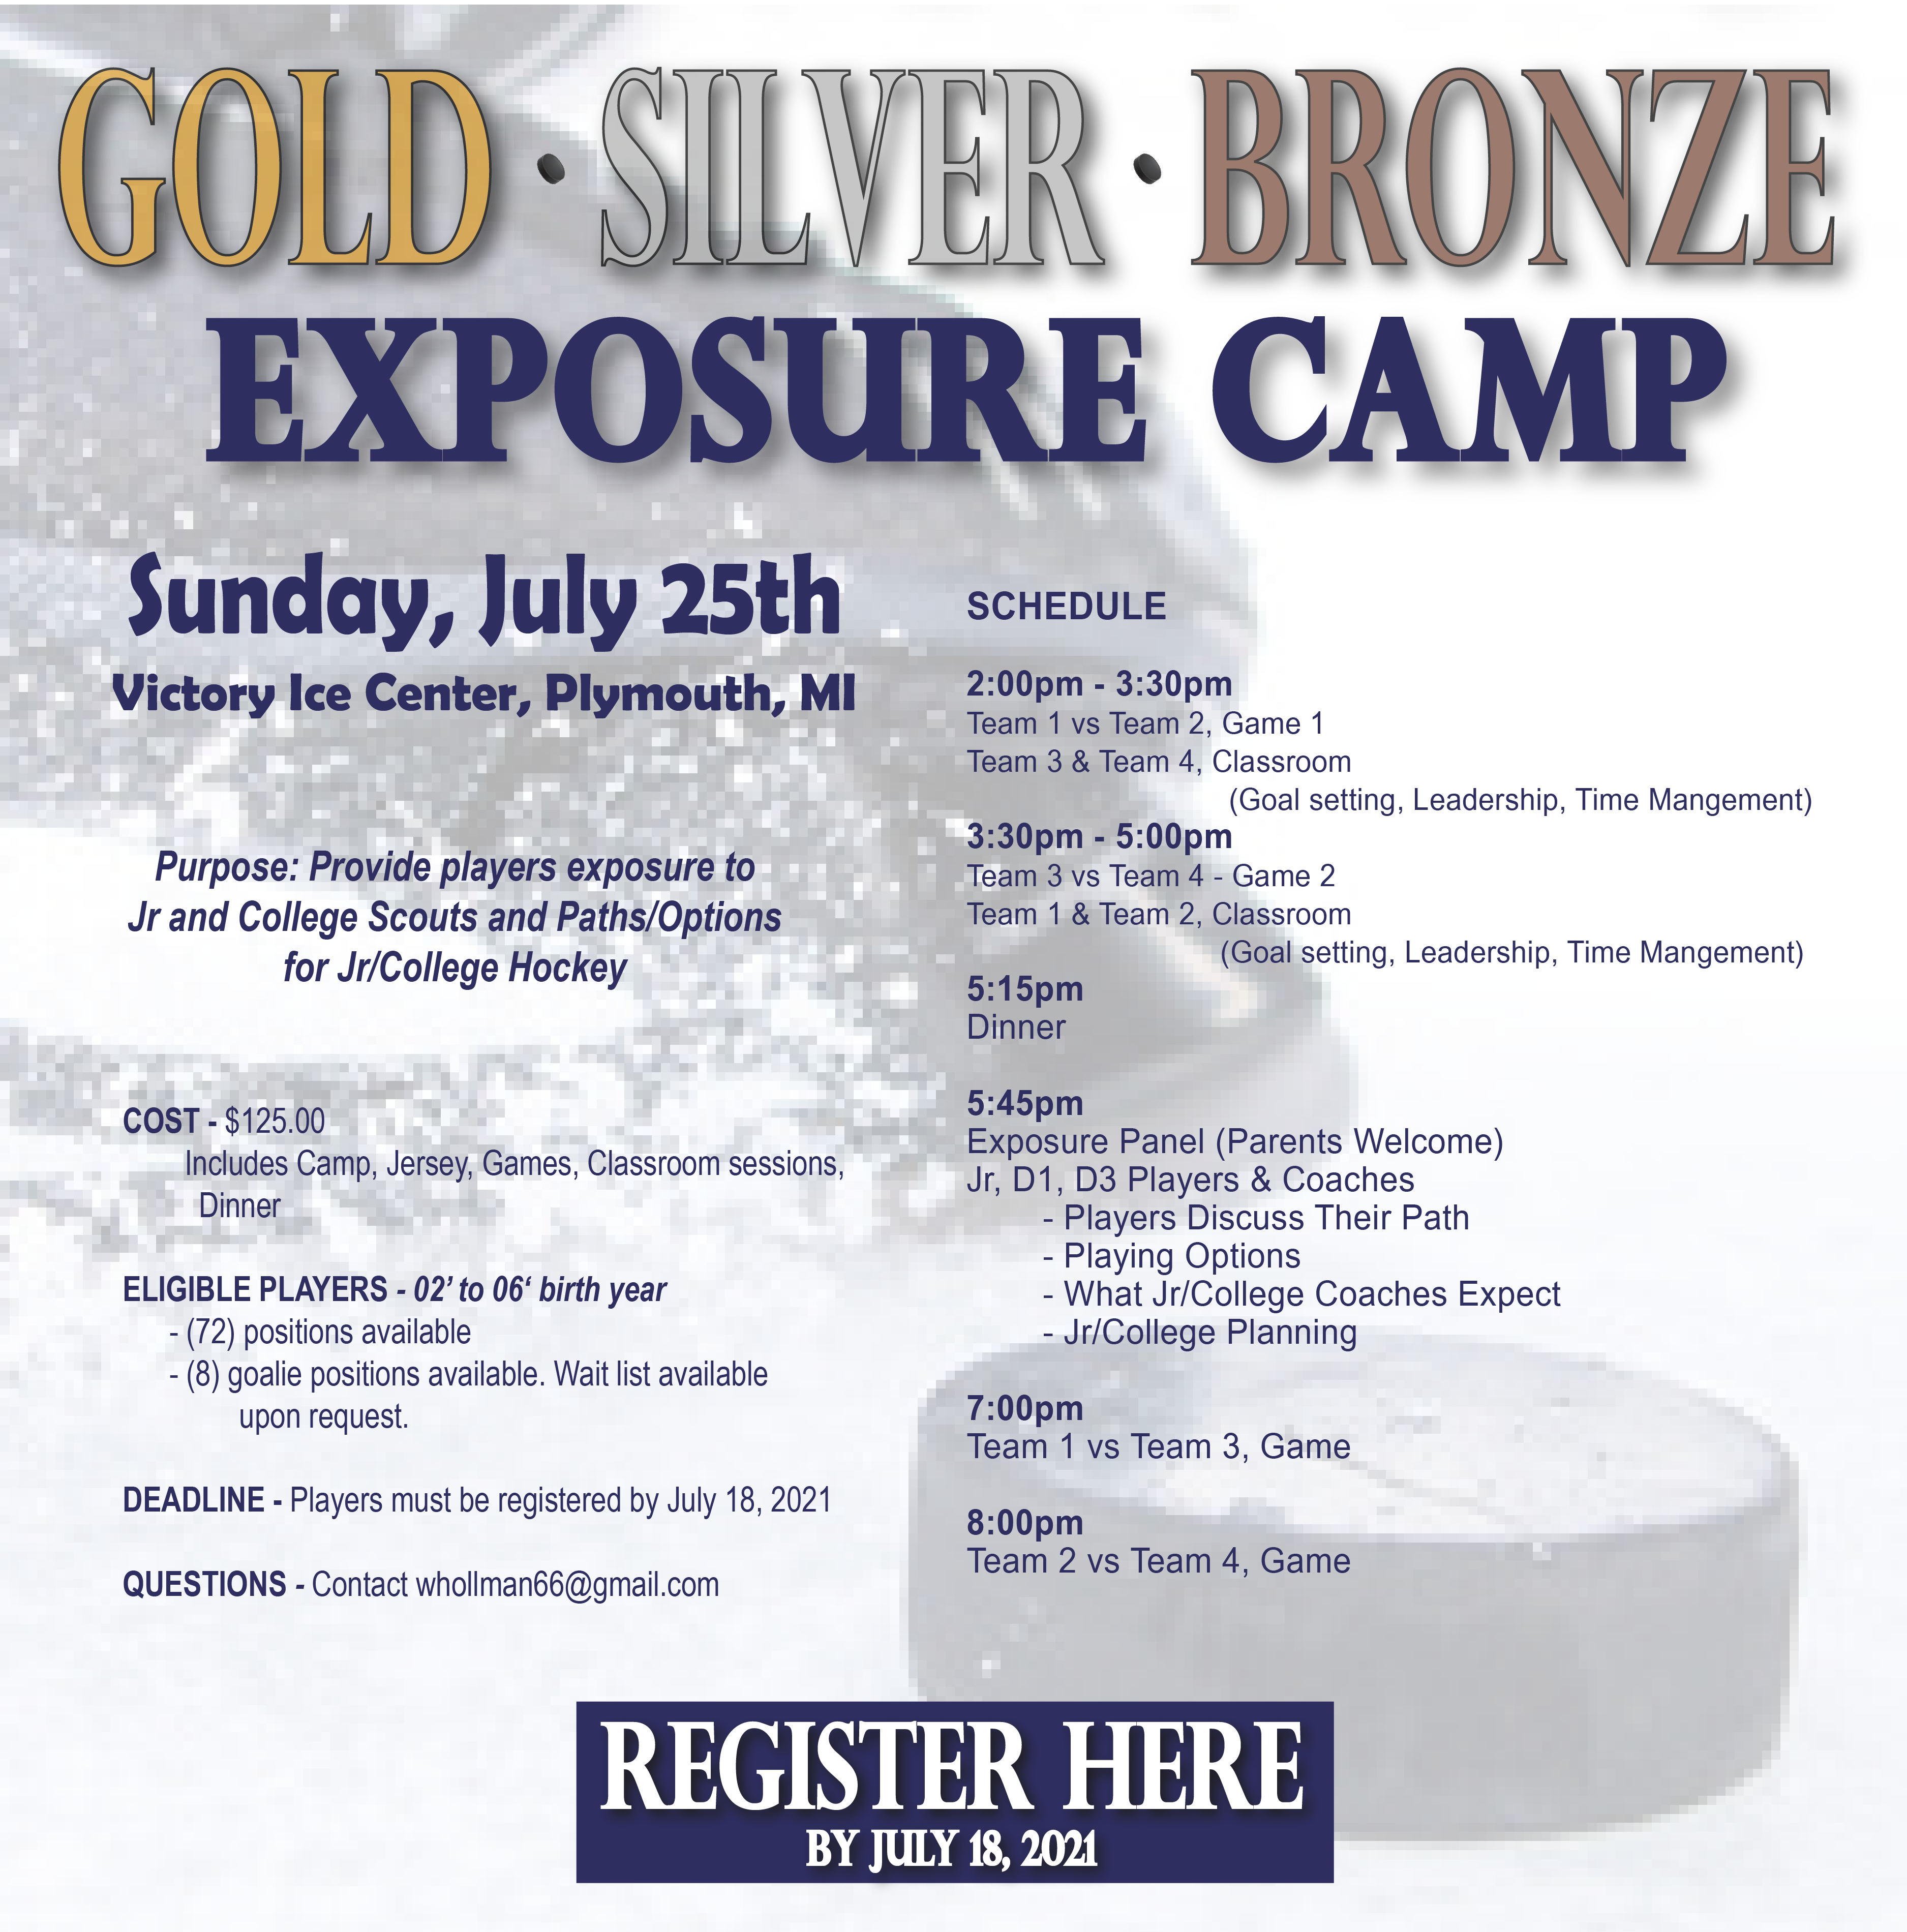 Gold Silver Bronze Exposure Jr Camp